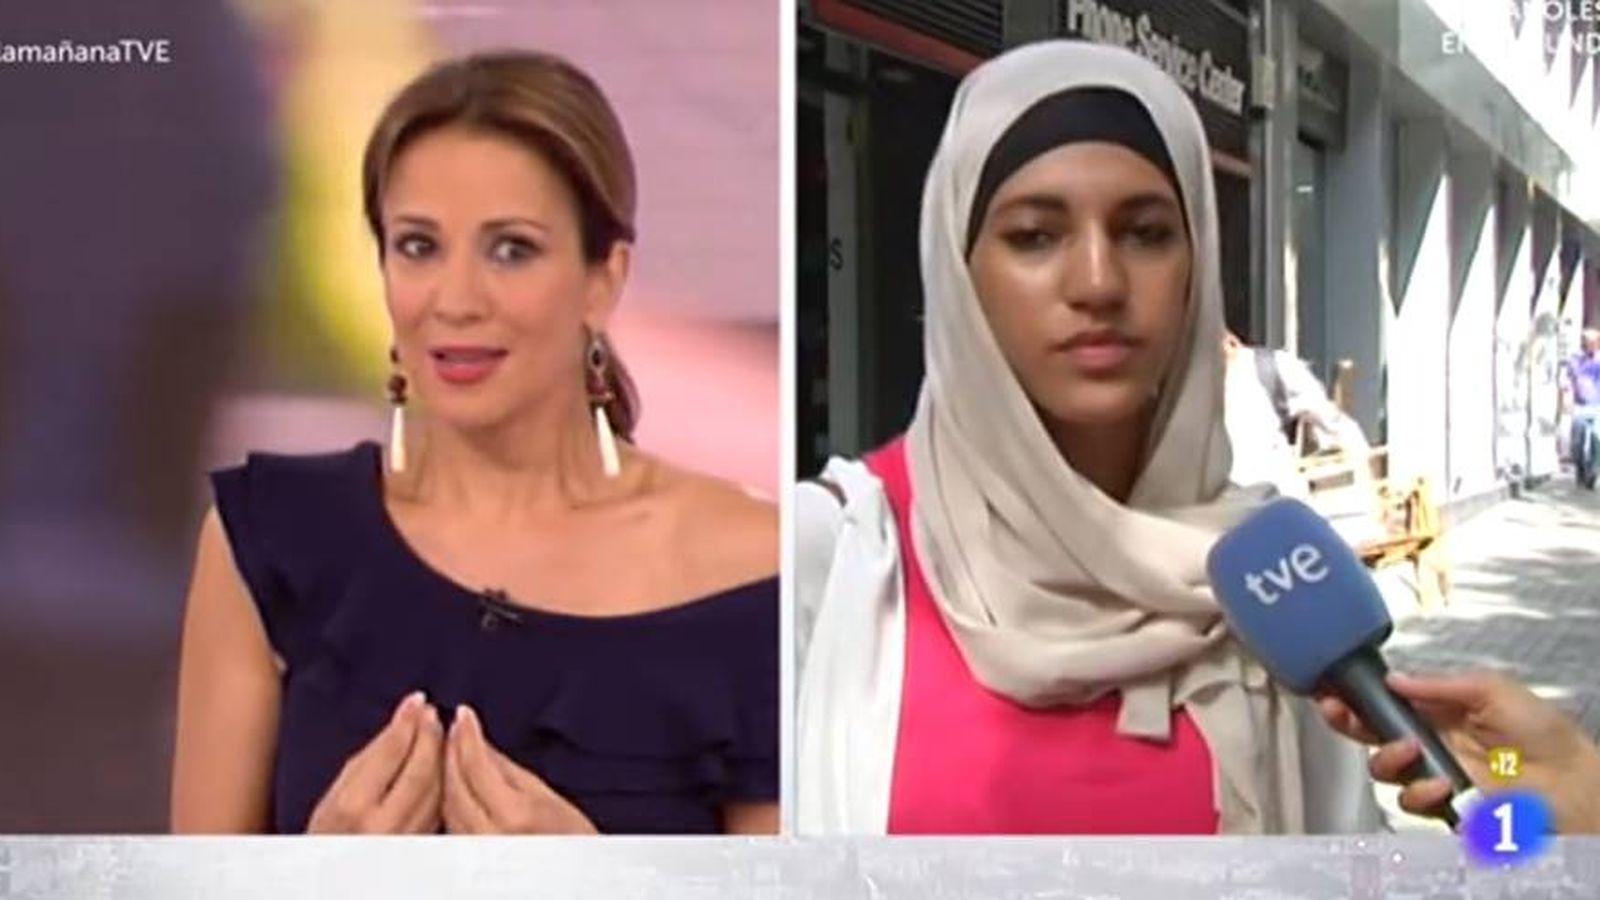 Foto: Polémica entrevista en TVE a una joven musulmana.